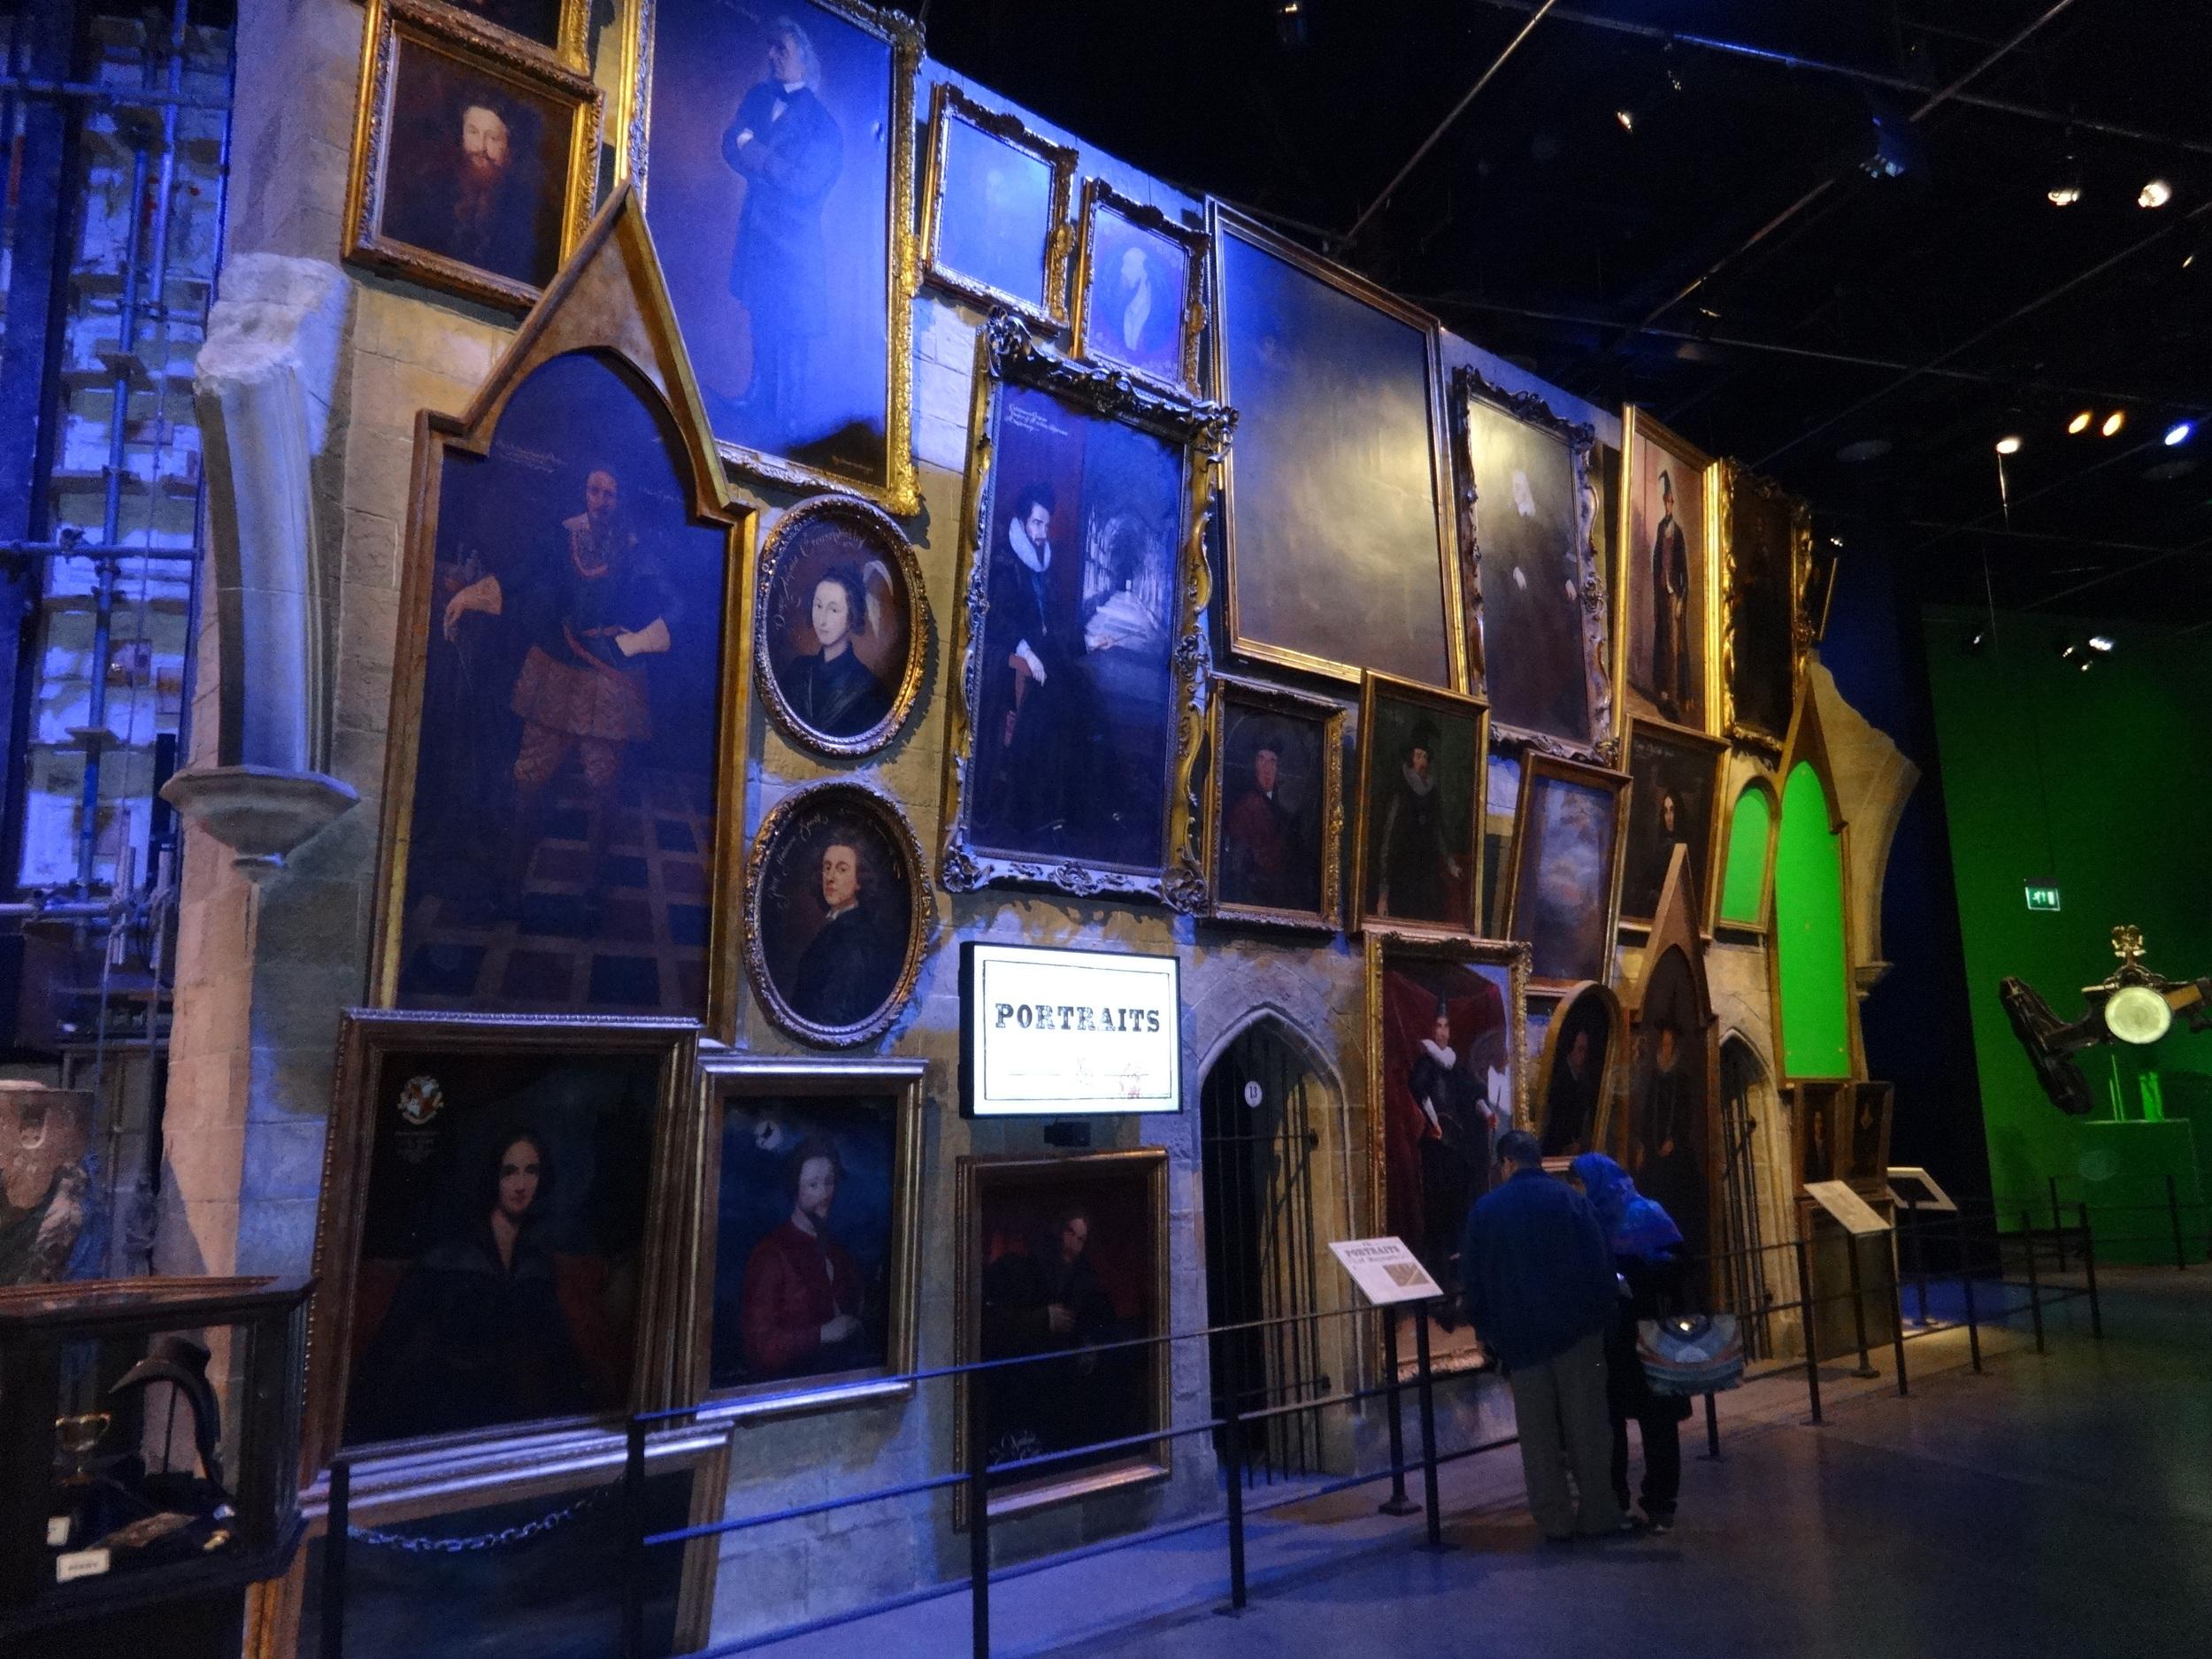 Hogwarts paintings